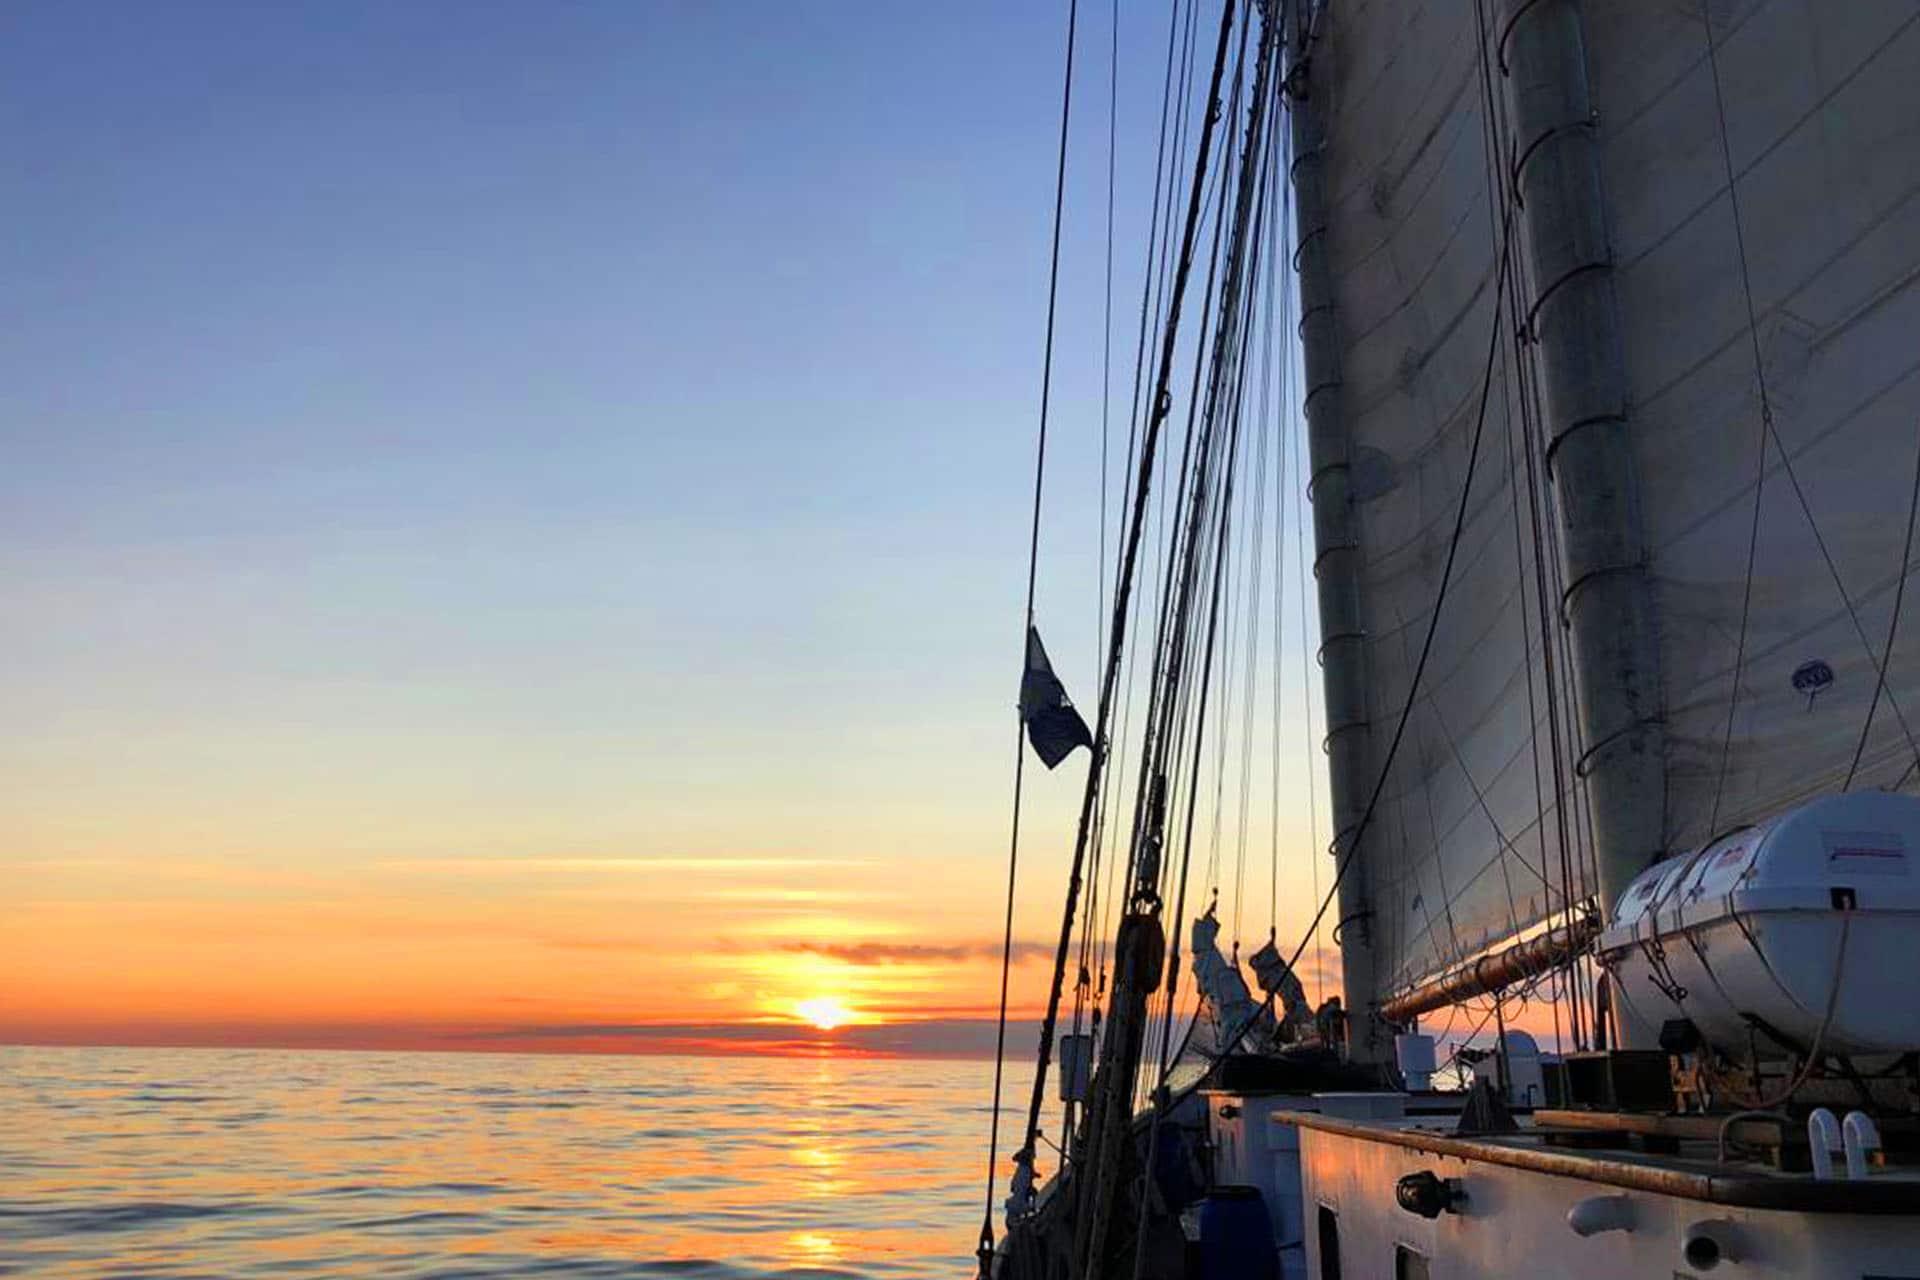 Blue Clipper sunset